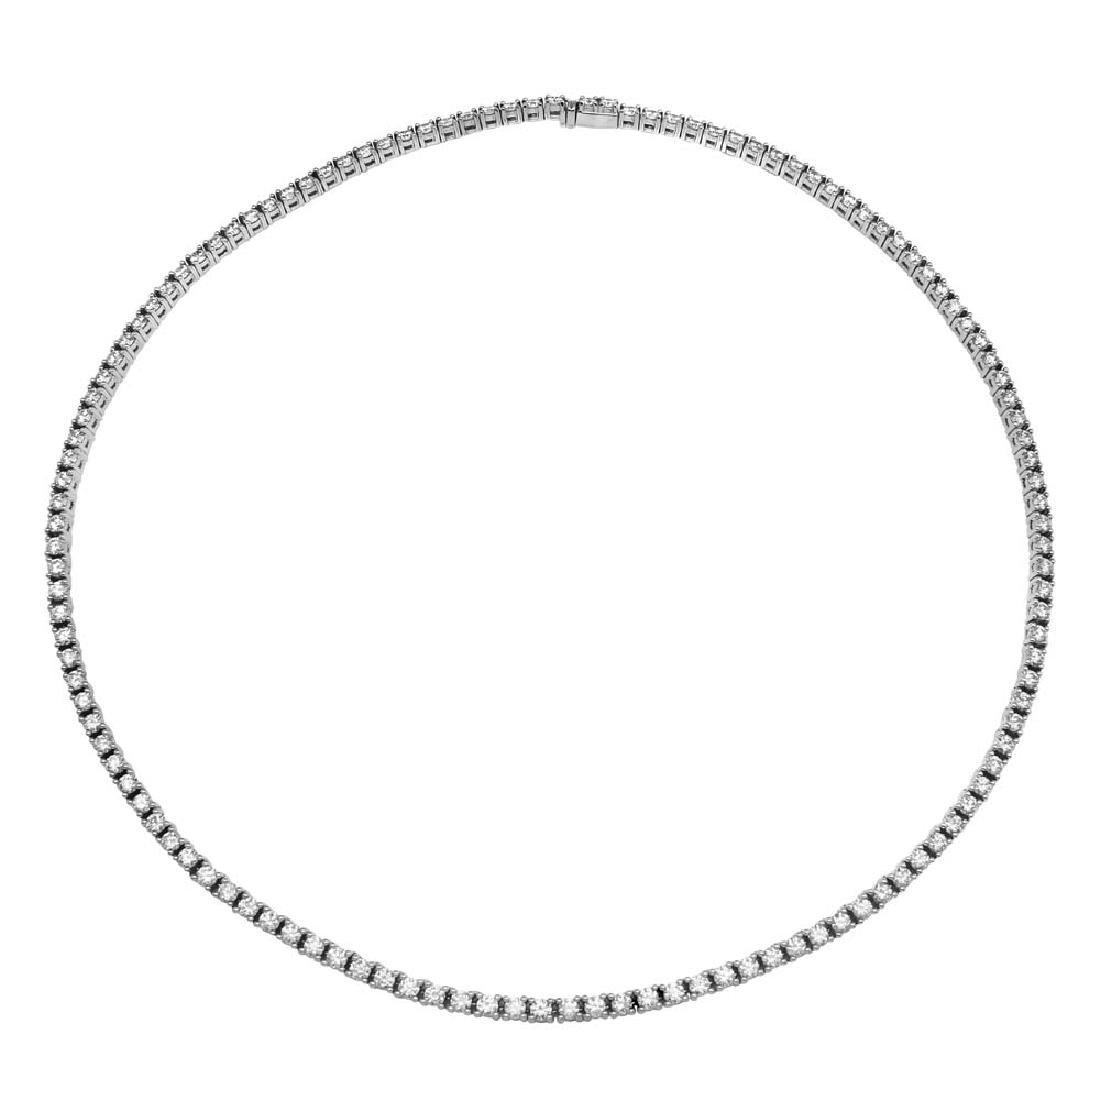 Genuine 11.23 TCW 18K White Gold Ladies Necklace